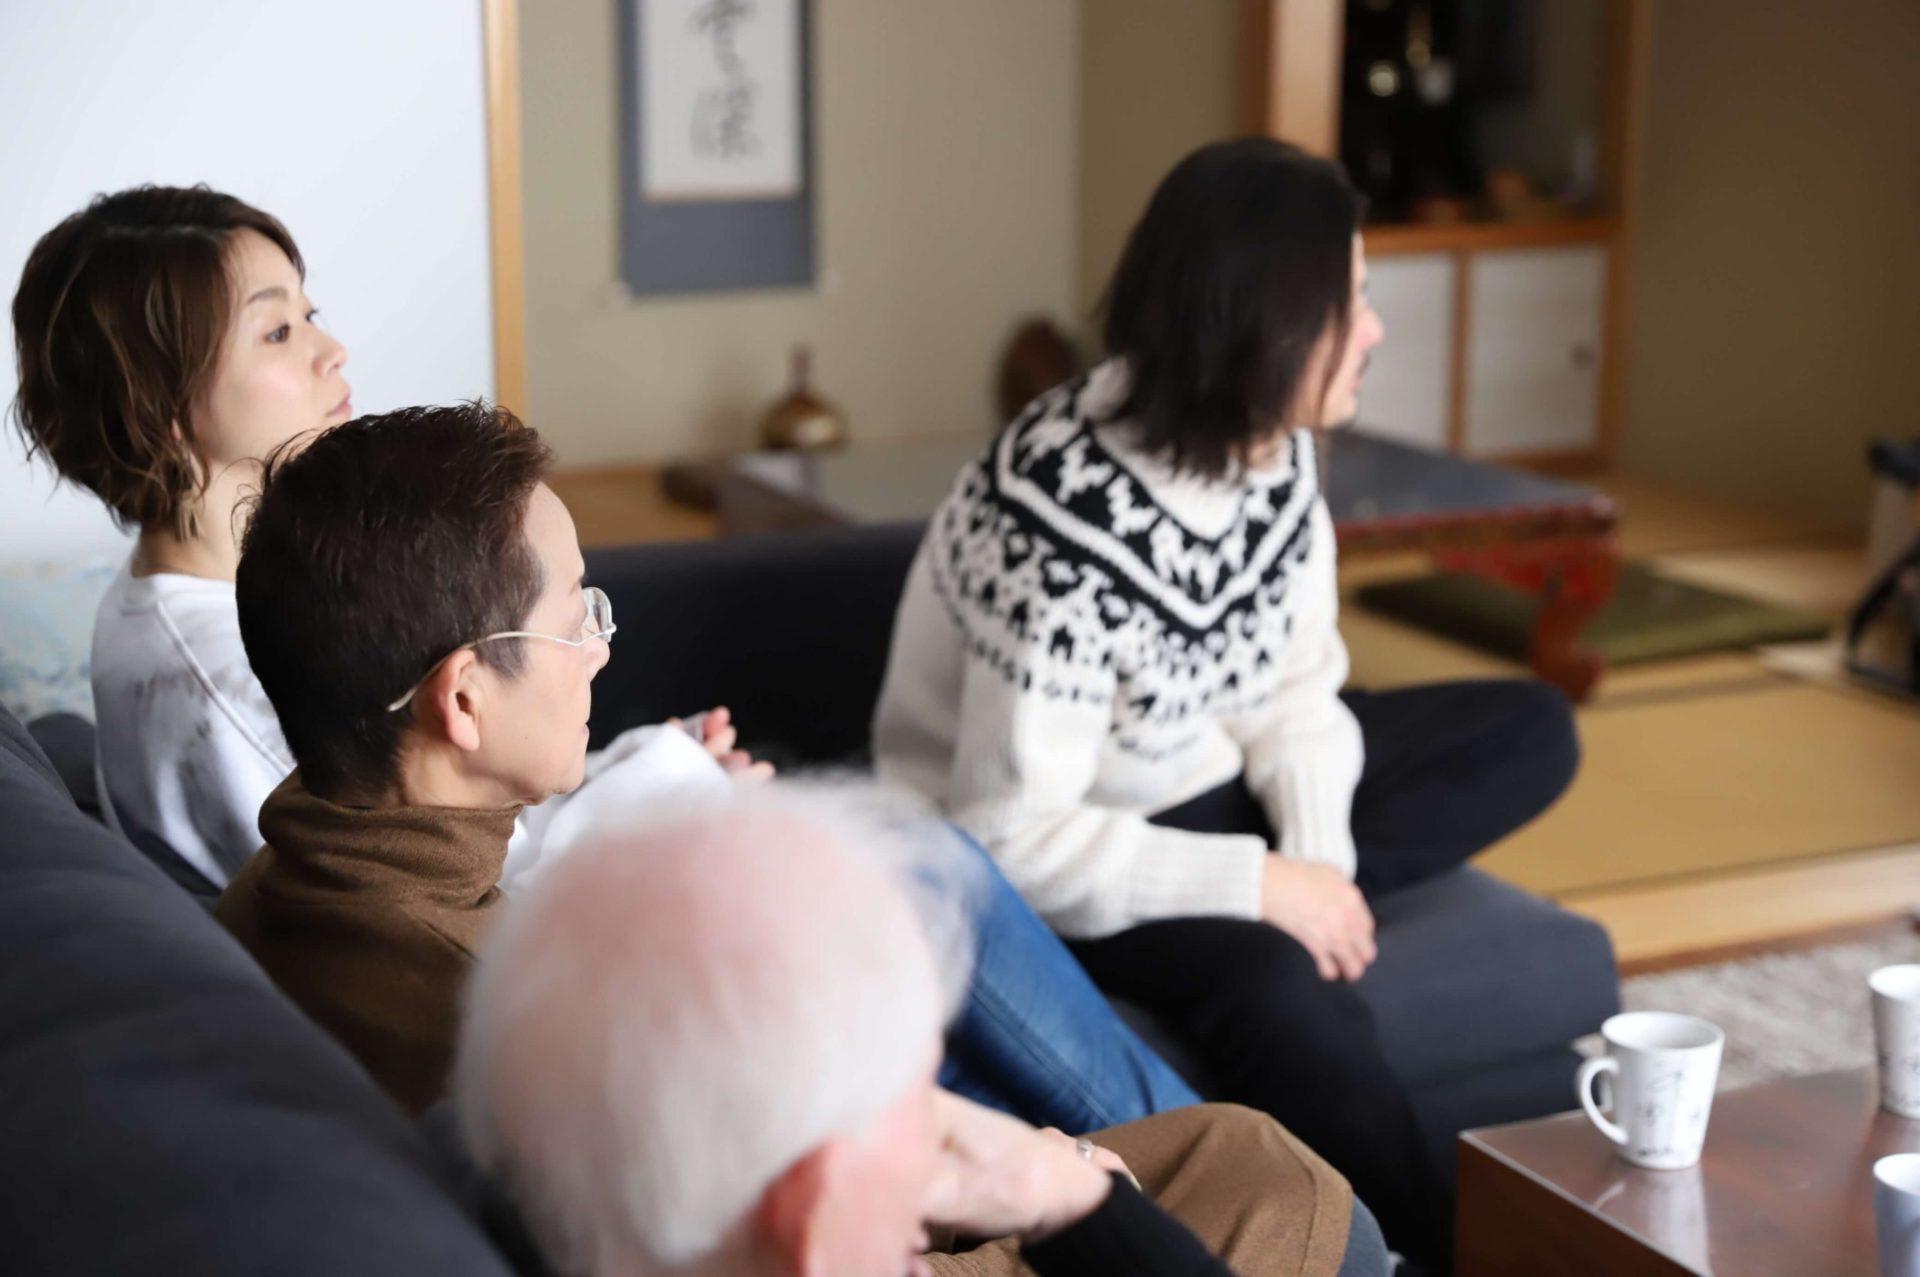 Shiawaseya-家族みんなが心地良く感じるしあわせな家